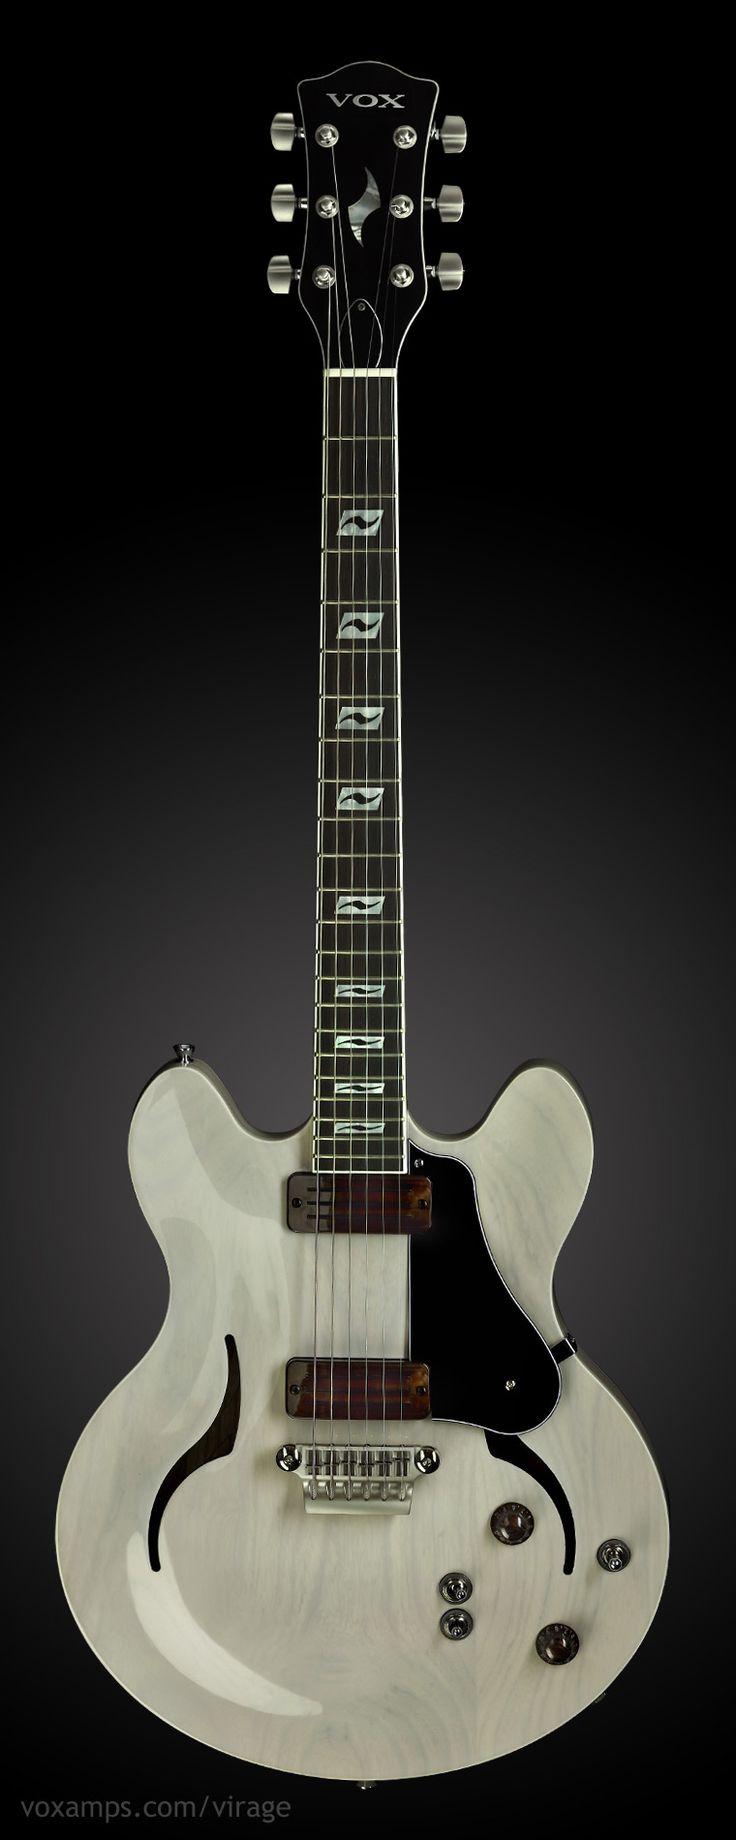 Dovetail template printable guitar - Vox Virage Guitar